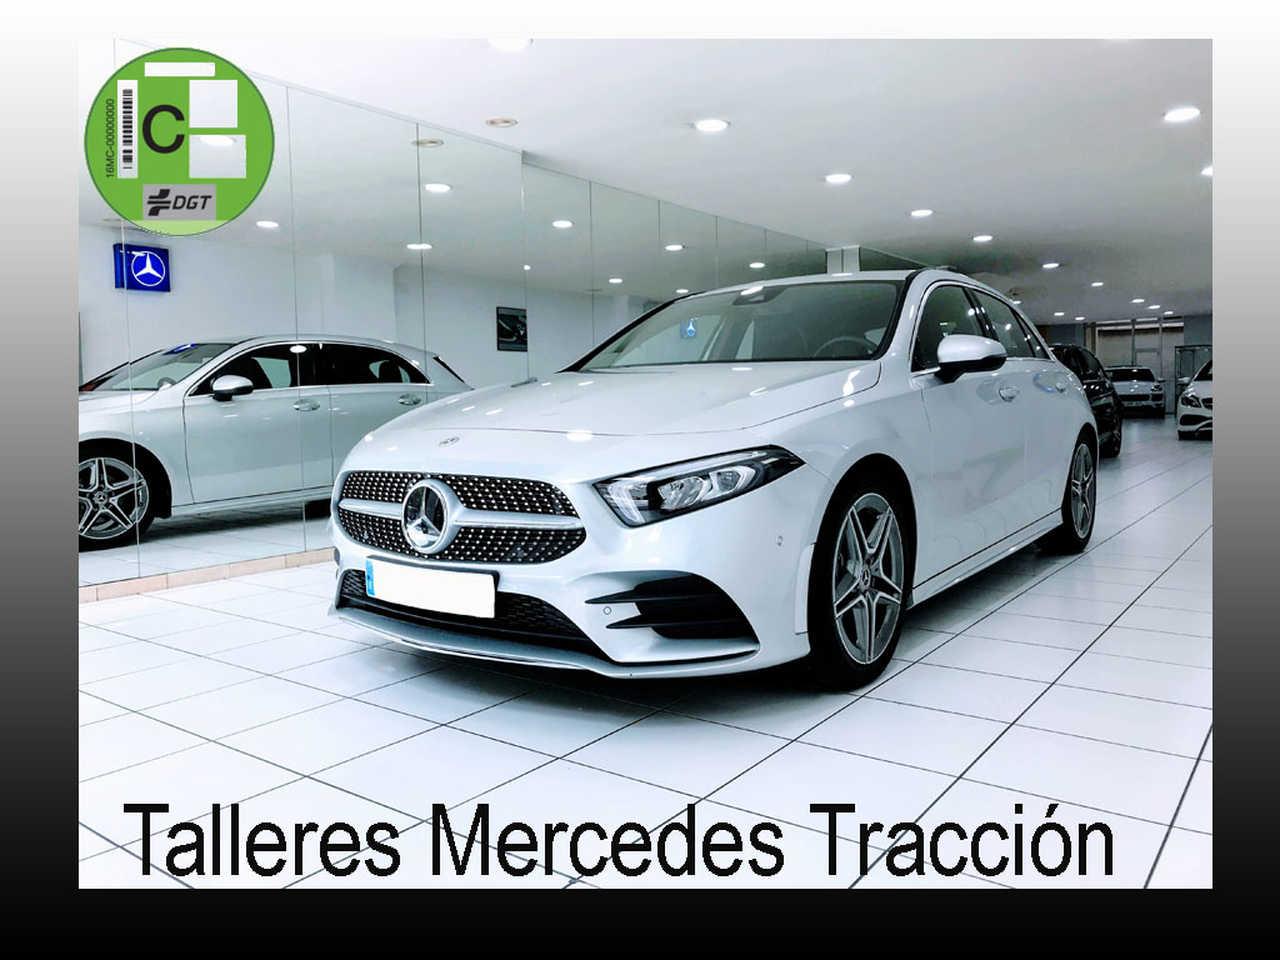 Mercedes Clase A 180 d 7G-DCT/AMG Line/MBUX/Camara   - Foto 1